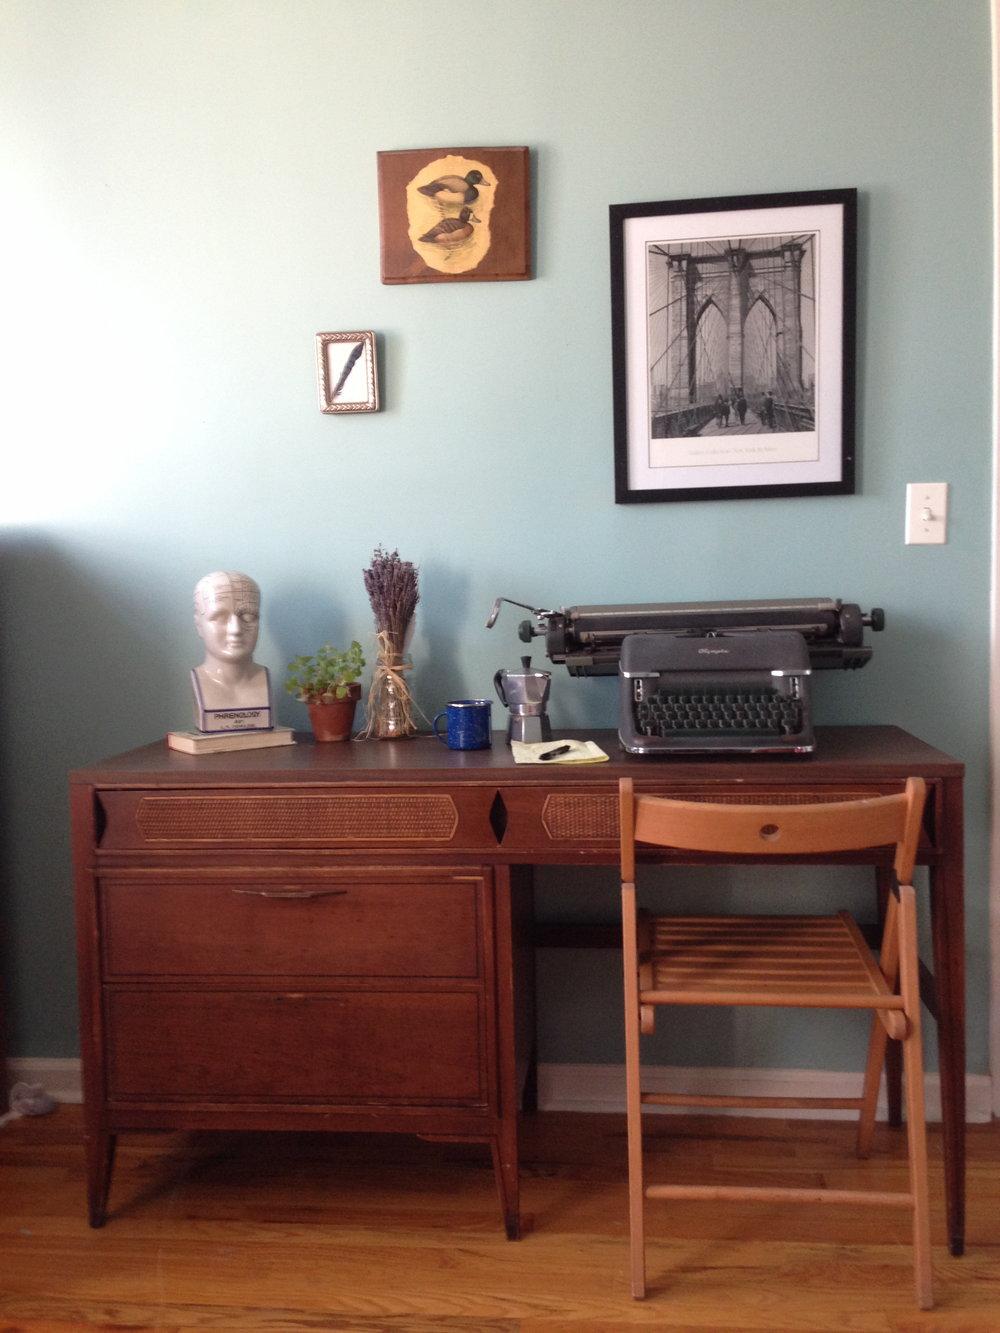 kent-coffey-desk-1.jpg